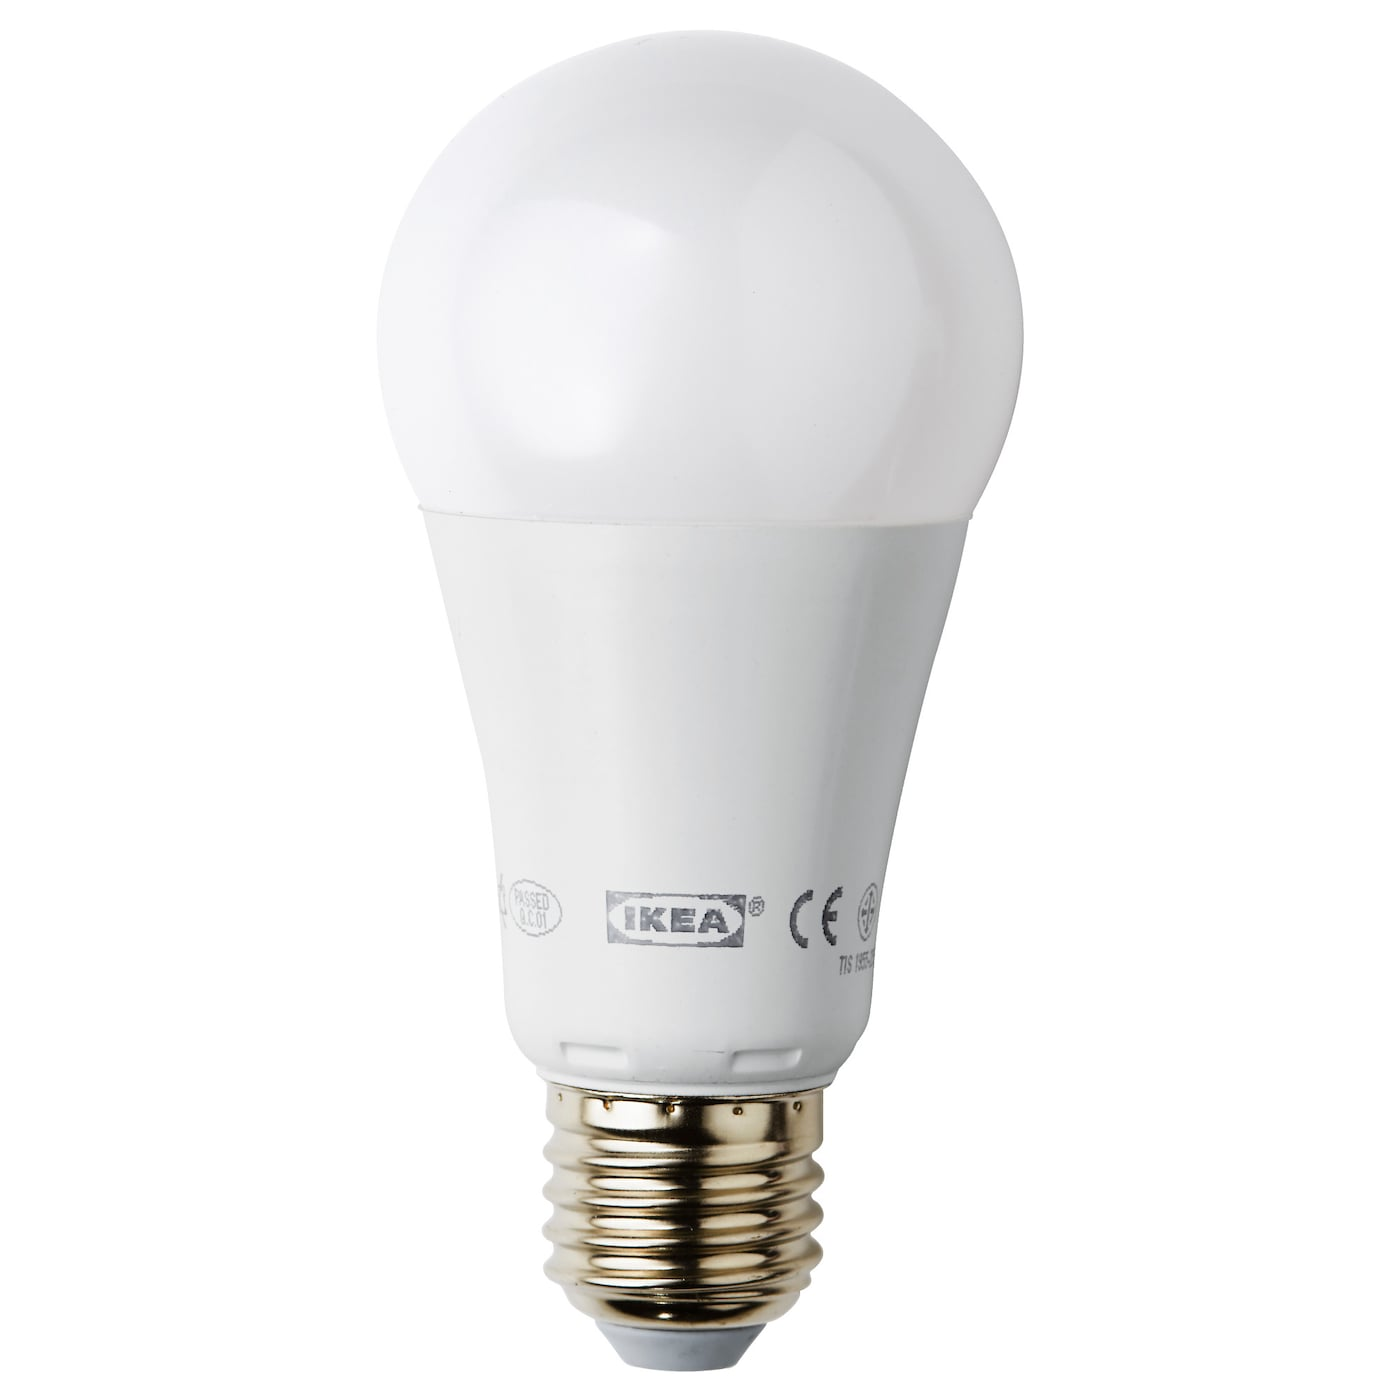 ledare led bulb e27 1000 lumen dimmable globe opal white. Black Bedroom Furniture Sets. Home Design Ideas